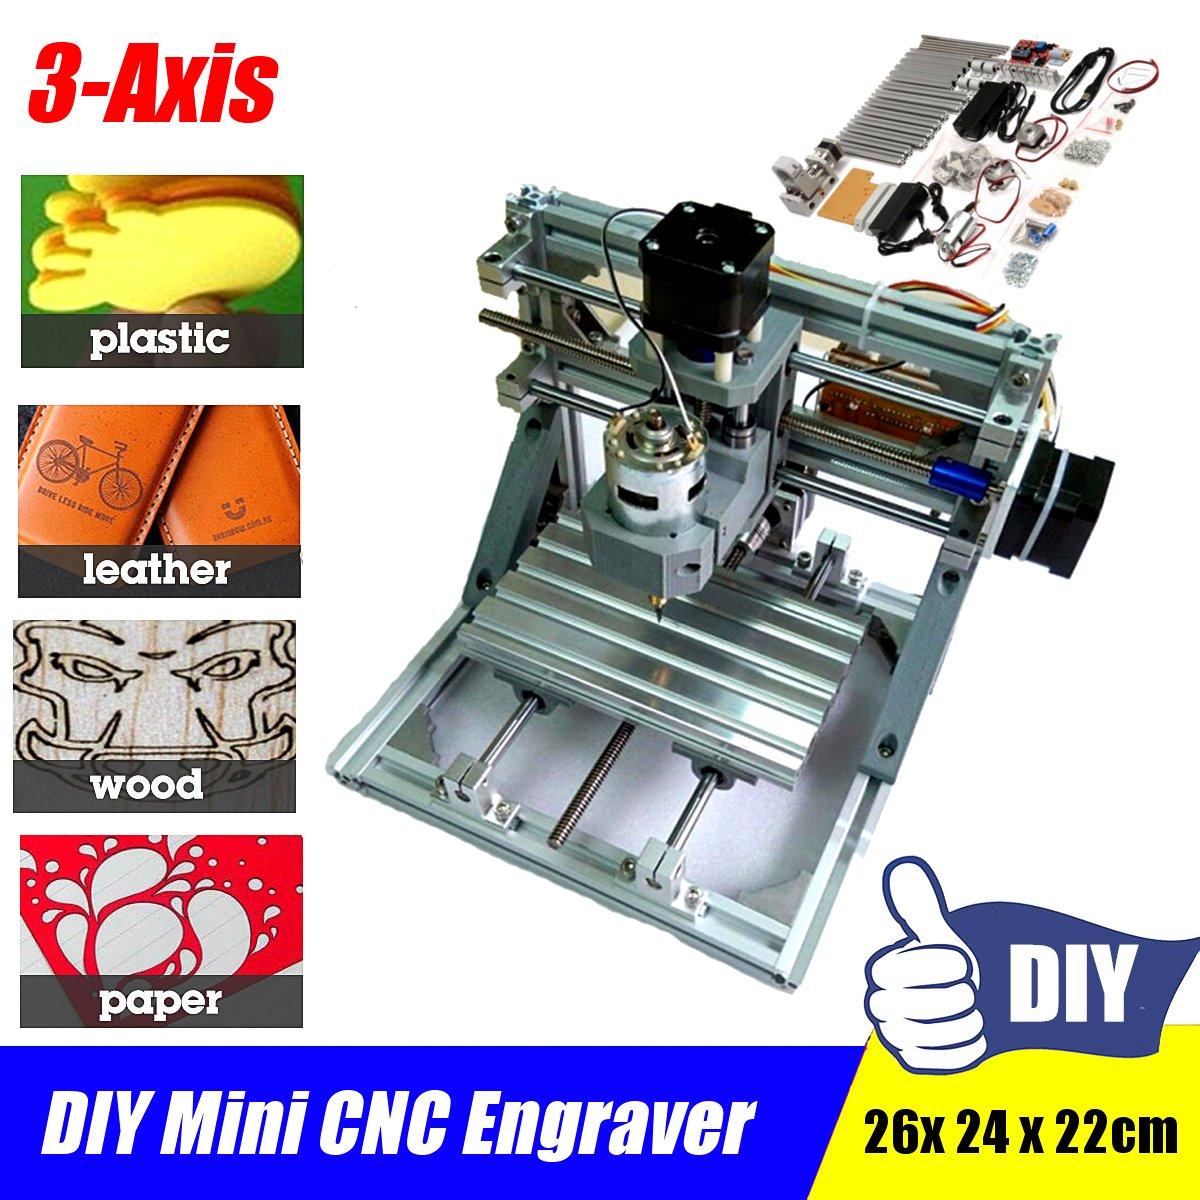 3-Axis Mini CNC Desktop Wood Router Engraver PCB PVC Milling Wood Carving Carving Machine GRBL DIY Set Kit